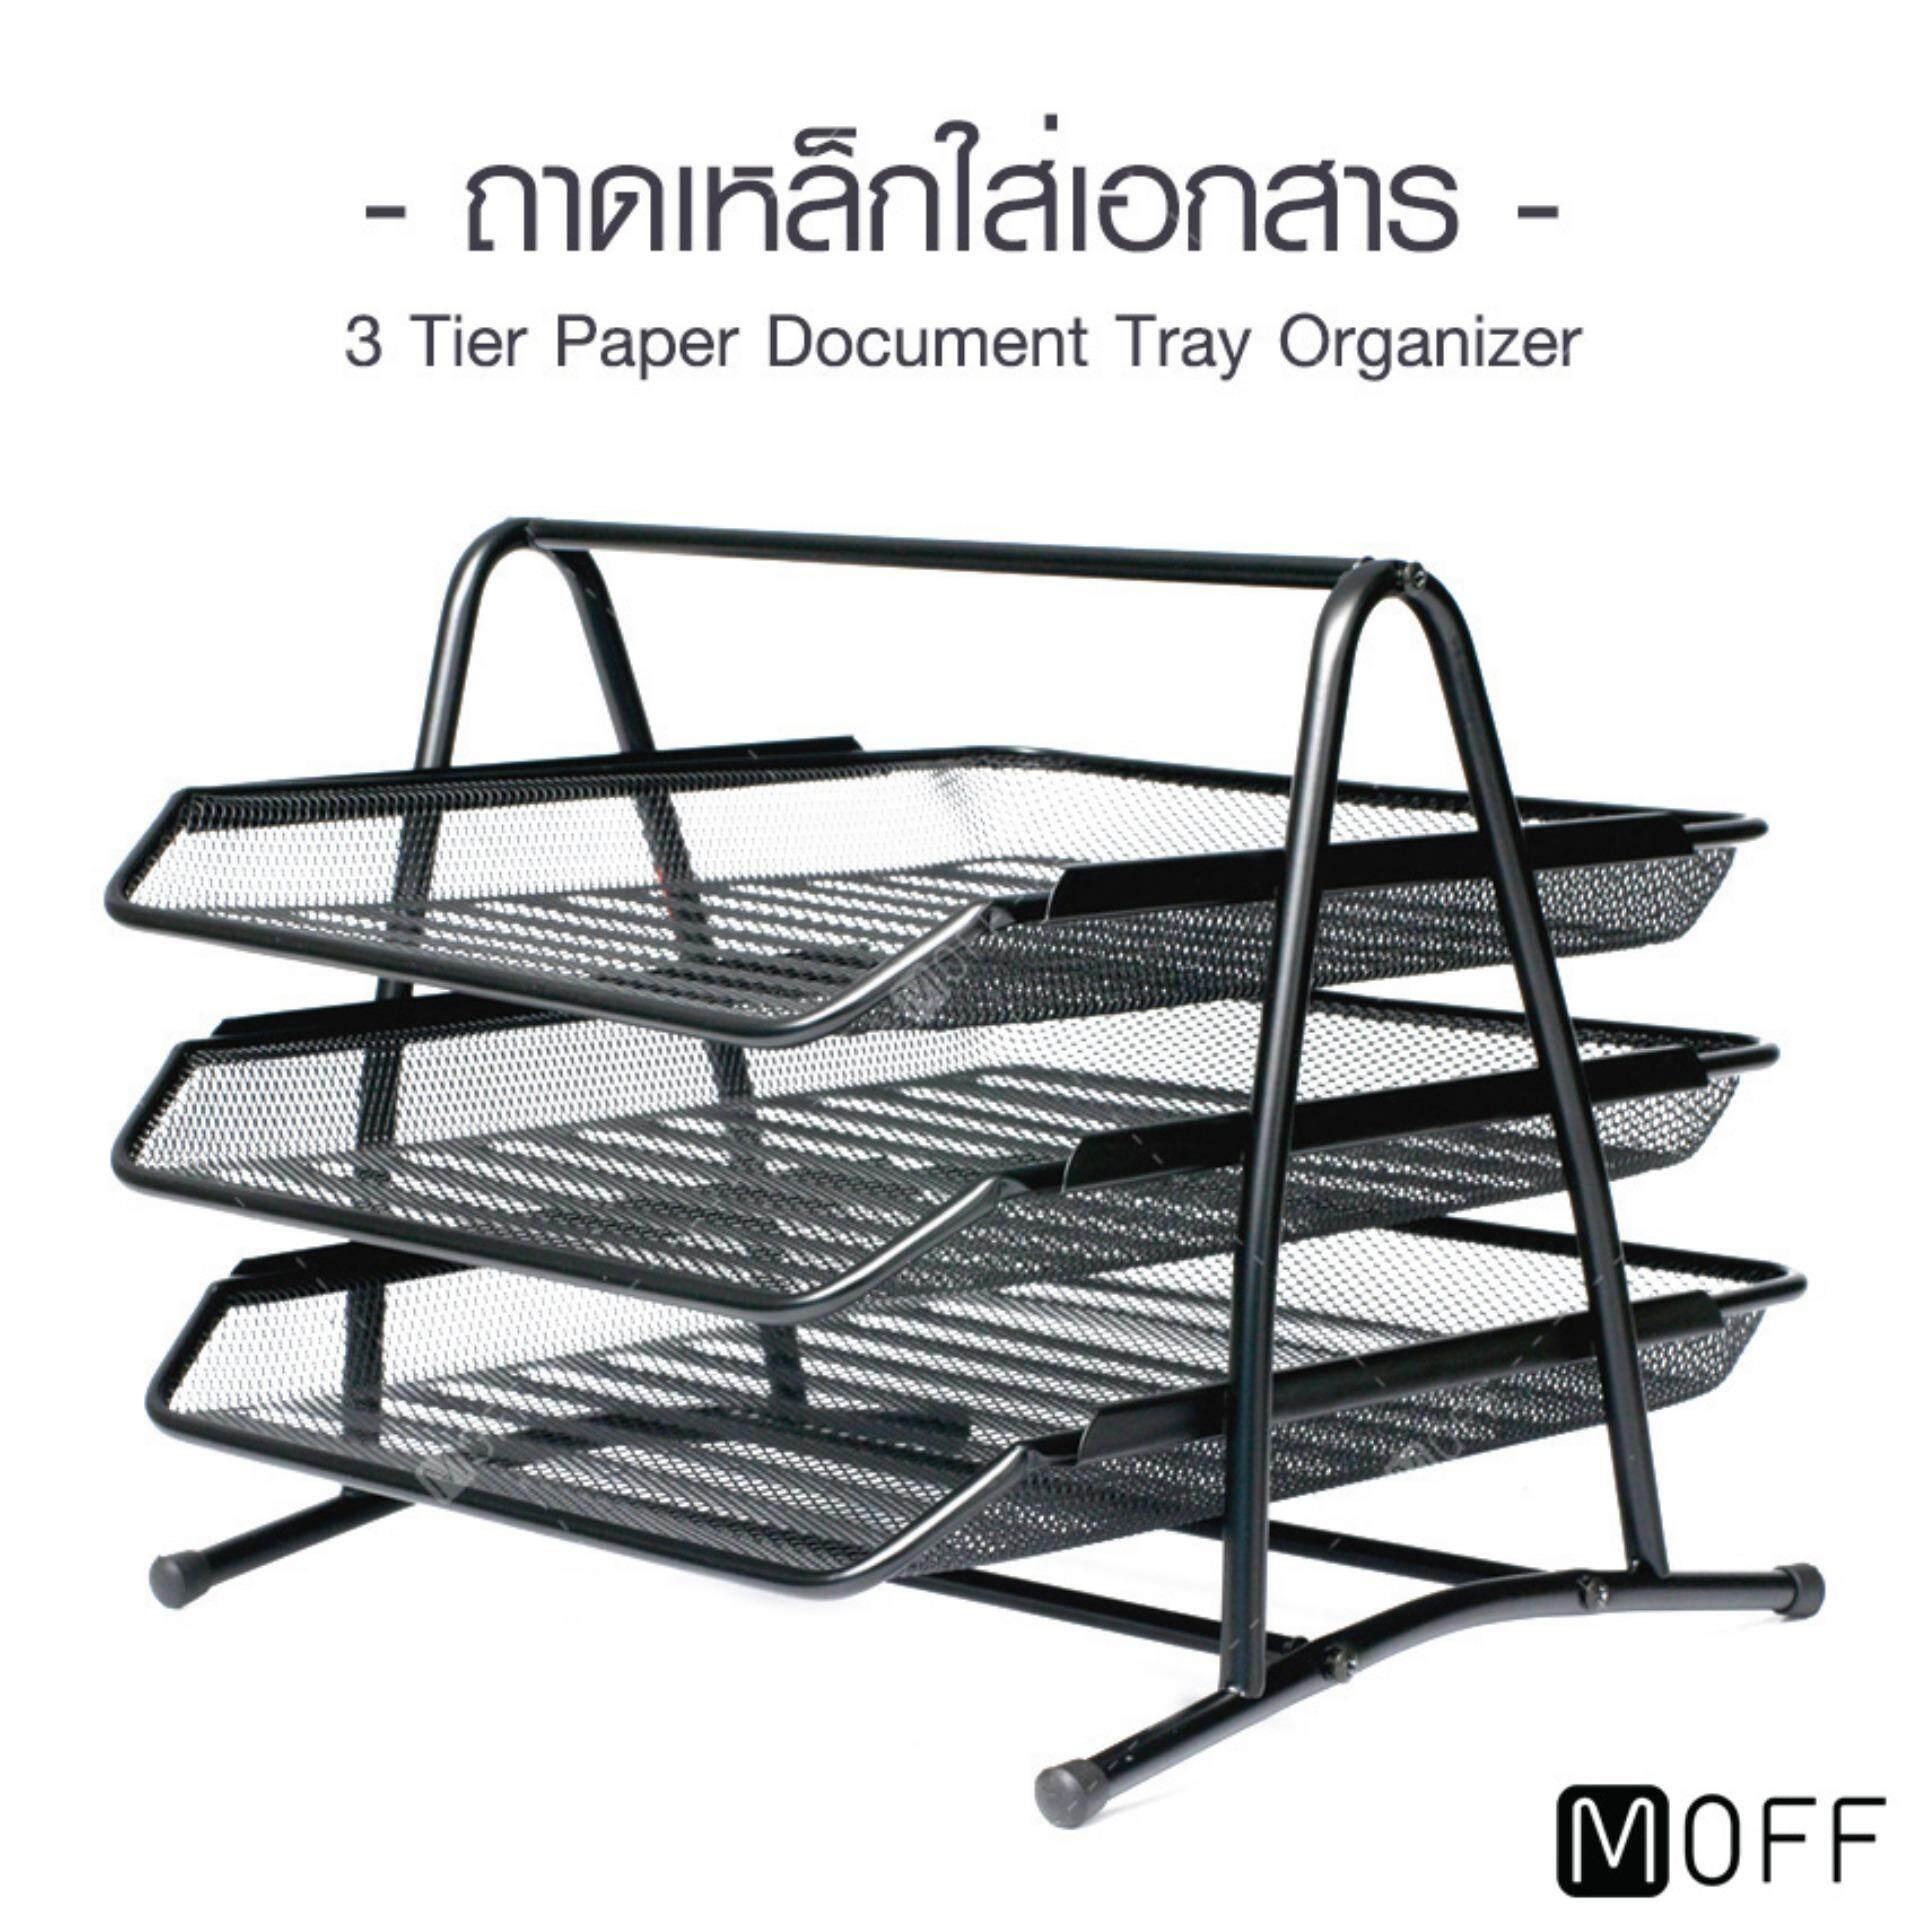 Moff ถาดเหล็กใส่เอกสาร 3 ชั้น 3 Tier Paper Document Tray Organizer ขนาดกระดาษ A4 รุ่น Kdo-0003 สีเงิน/สีดำ (silver/black).